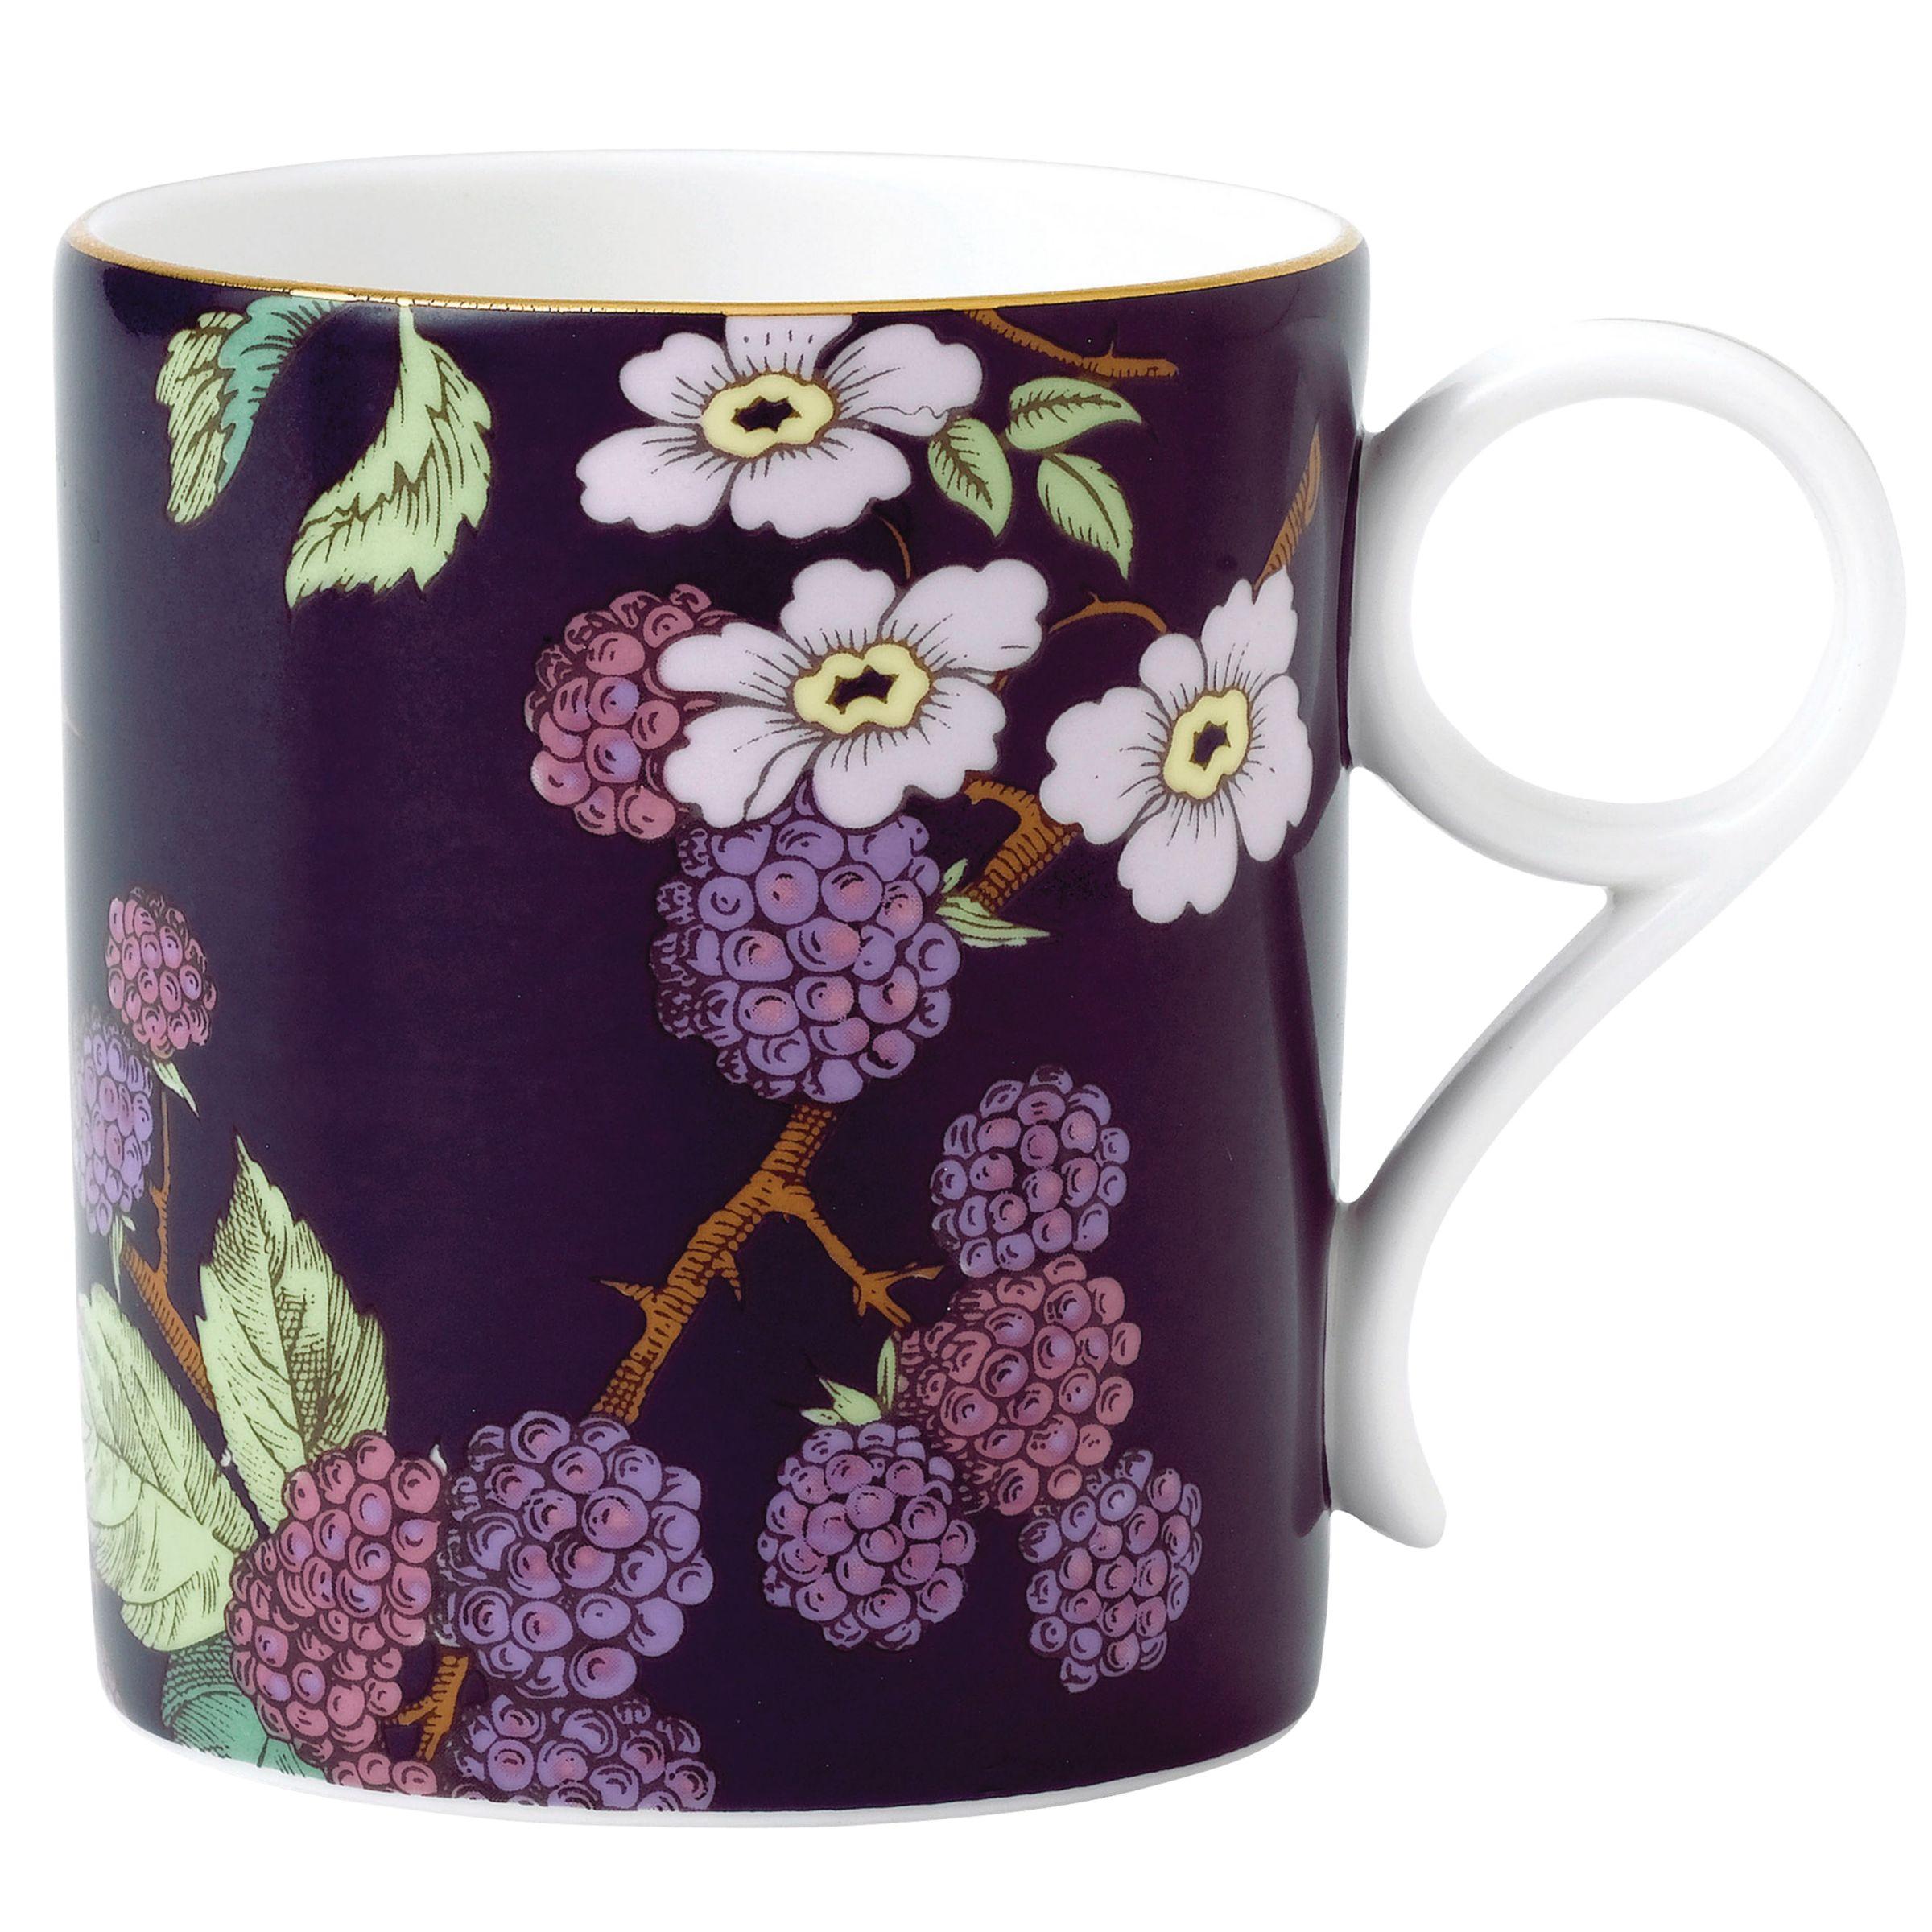 Wedgwood Wedgwood Tea Garden Blackberry Mug